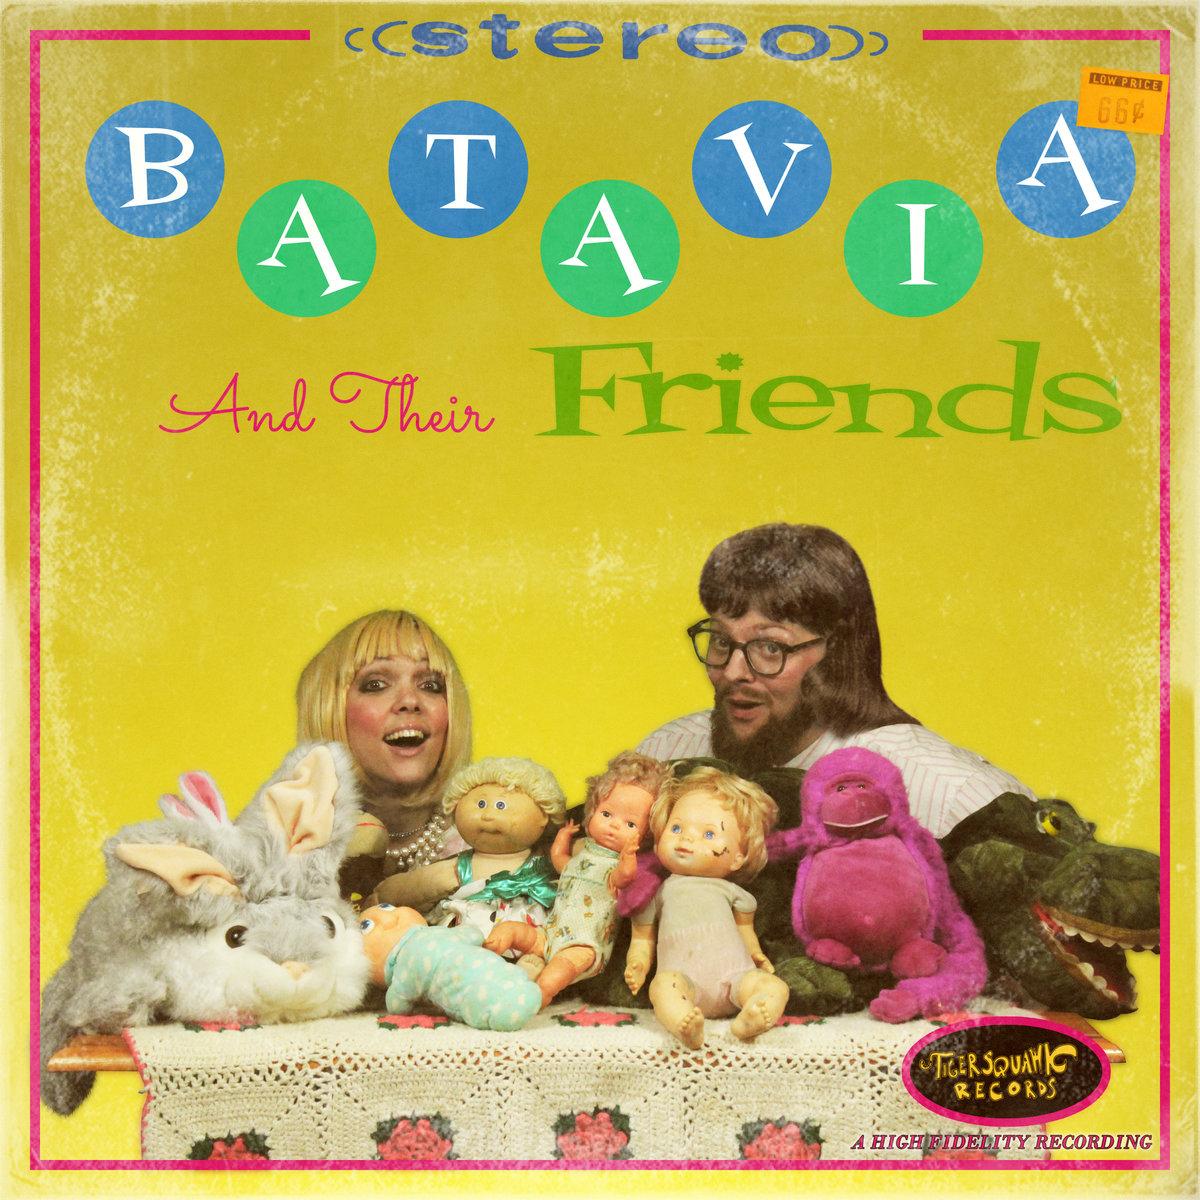 bataviaandtheirfriends.jpg.3965ee198e32307e699ea13dc921e85b.jpg